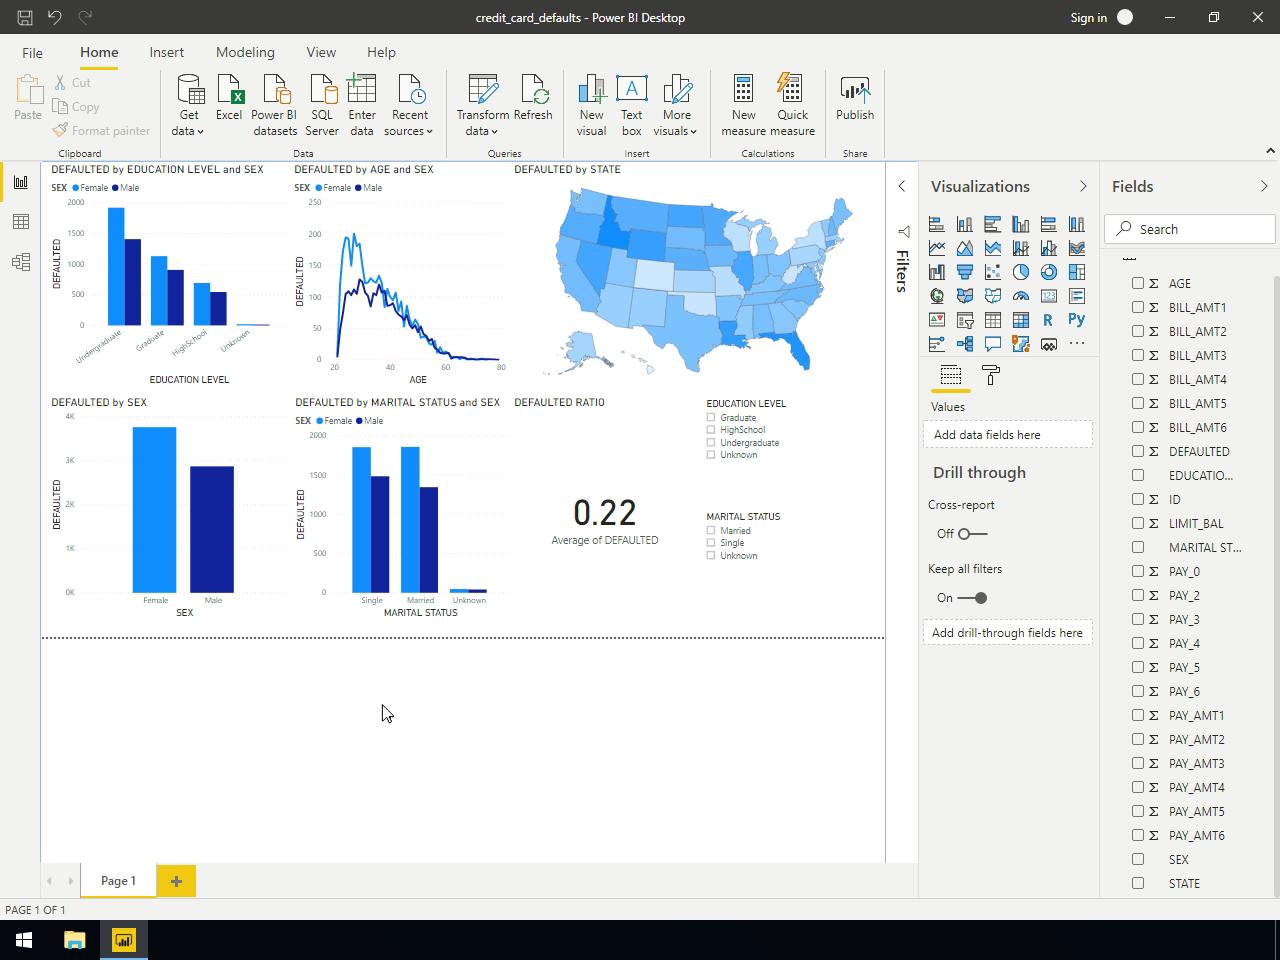 Getting Started with Power BI Desktop